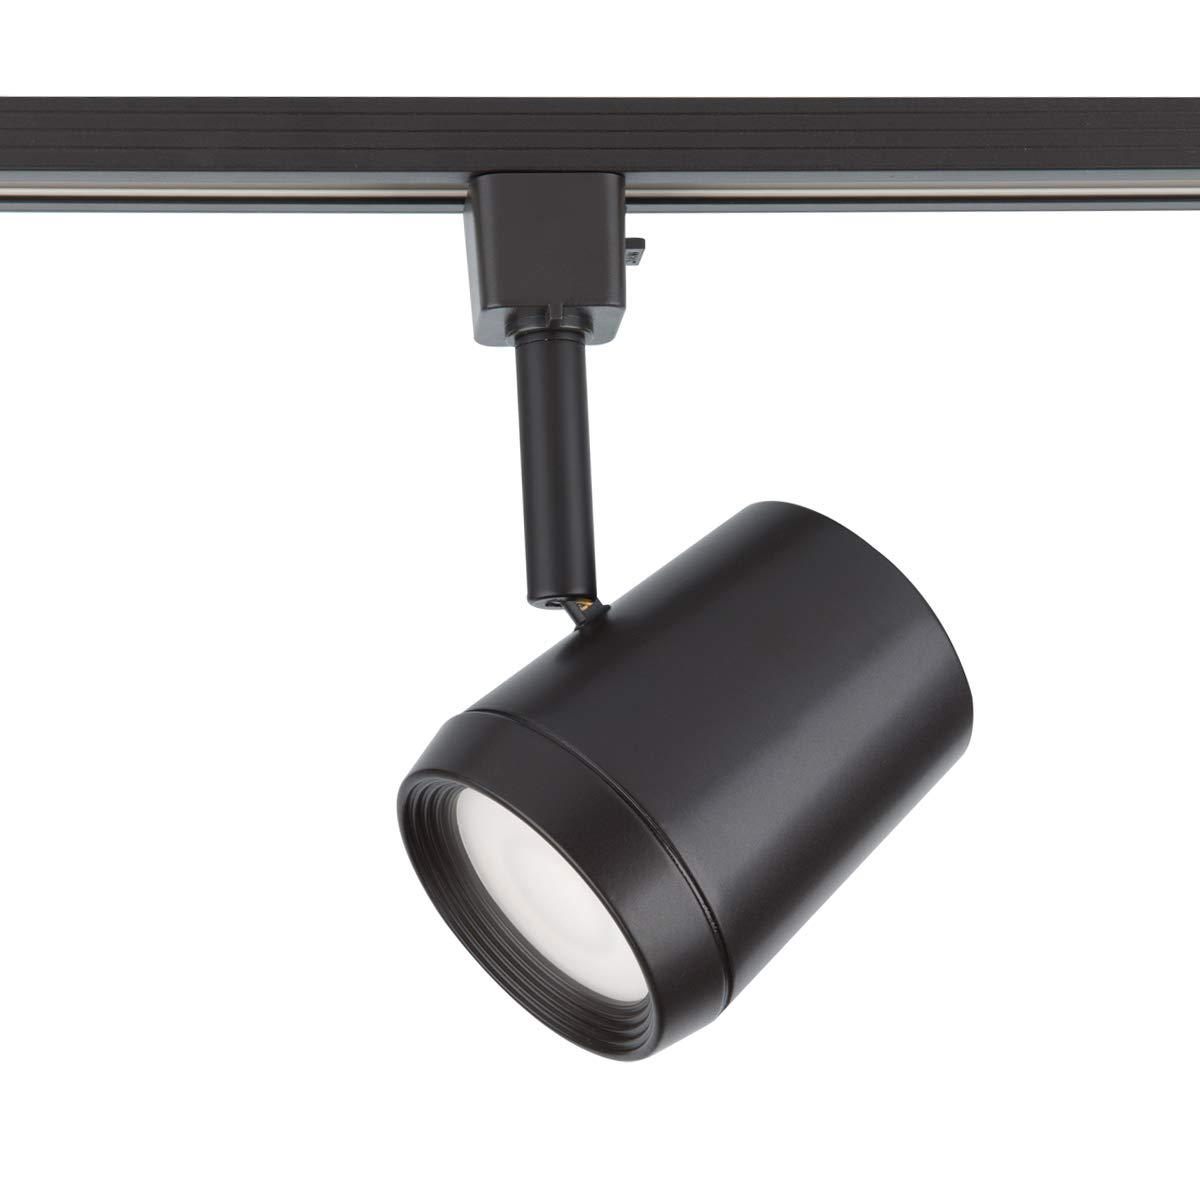 WAC Lighting H-7030-930-DB Oculux 7030 LED Track Head Light Fixture, H, Dark Bronze